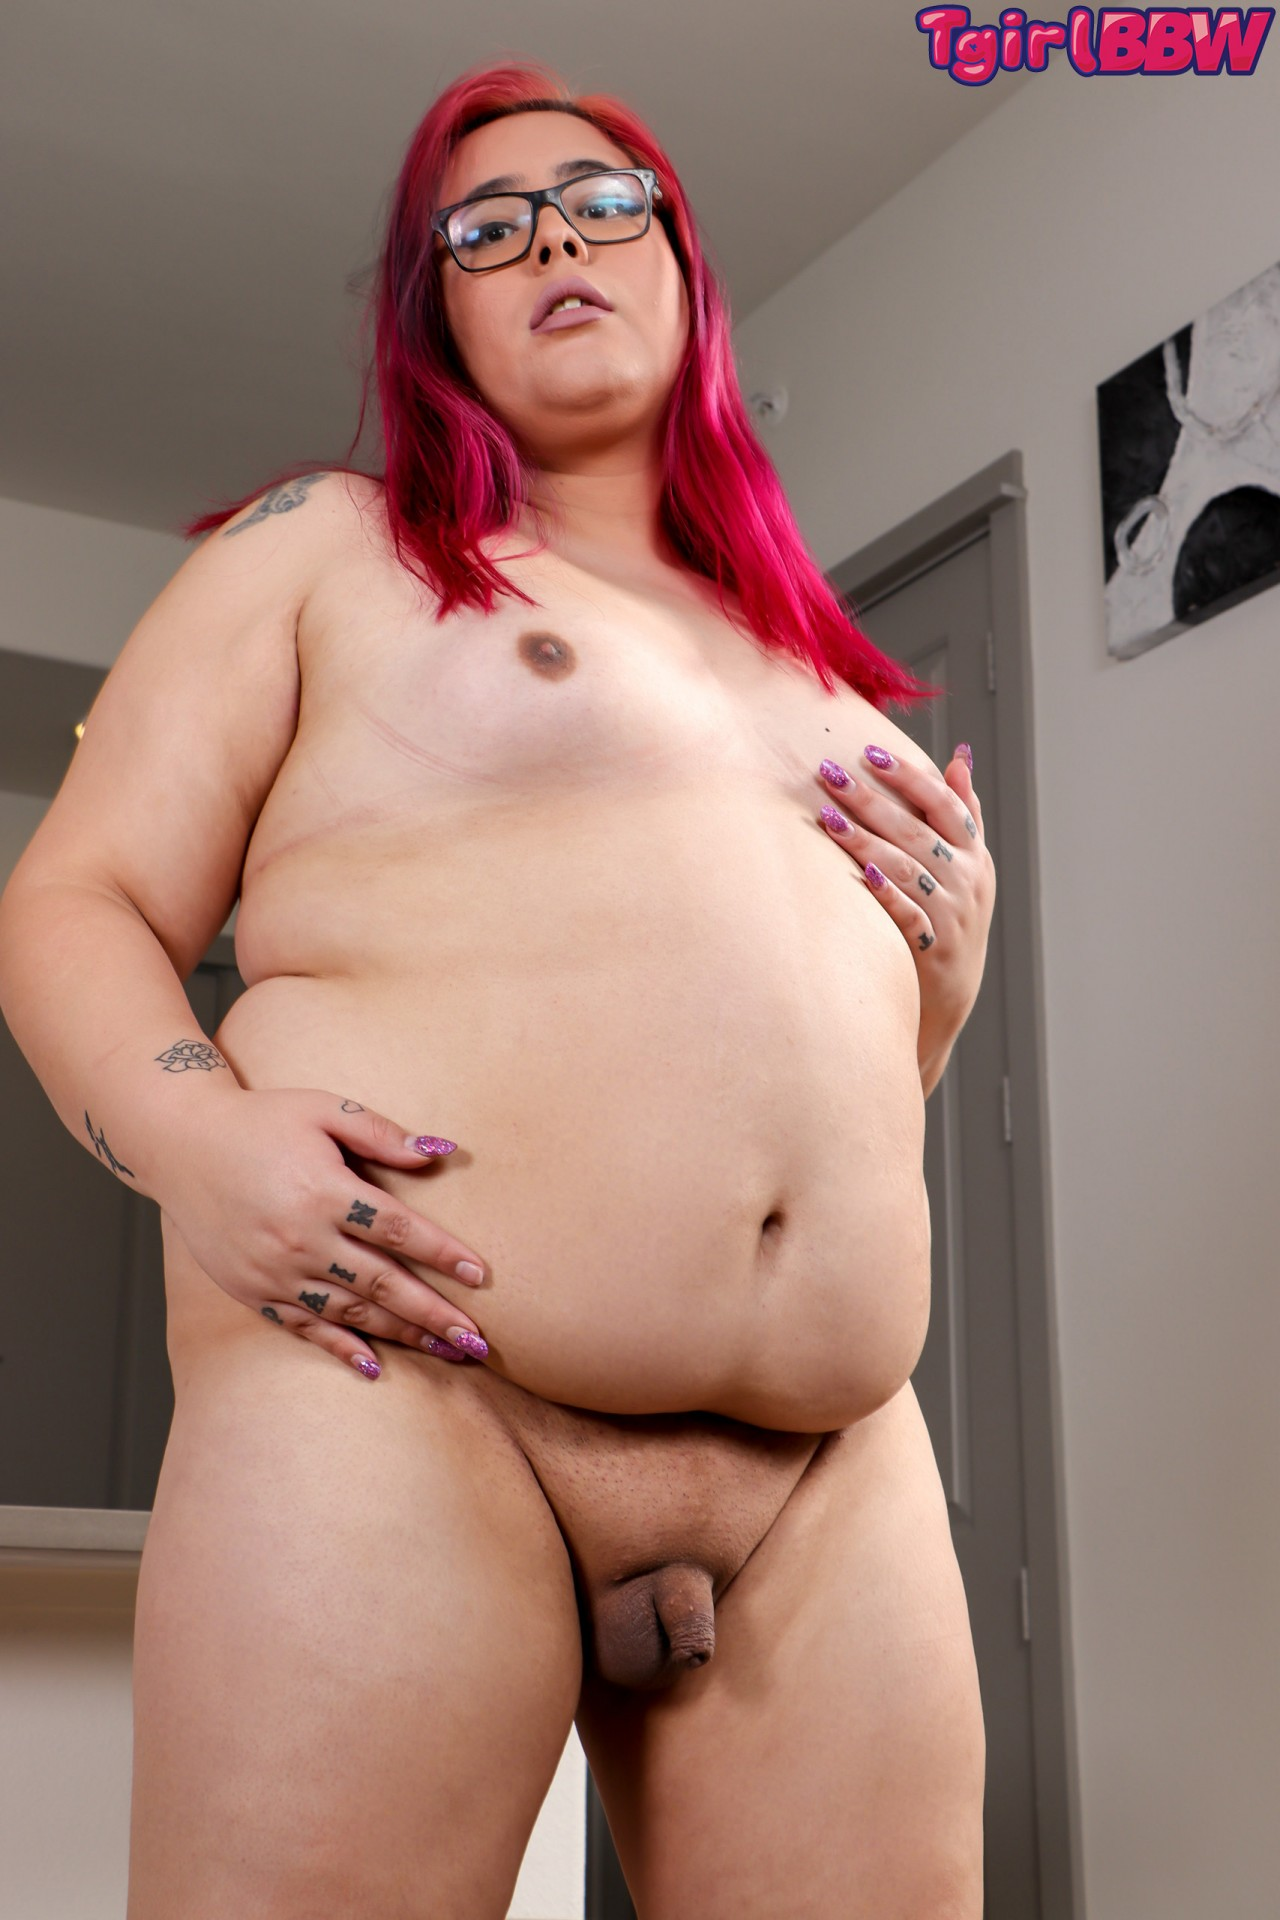 Imagens de Transexuais (2)